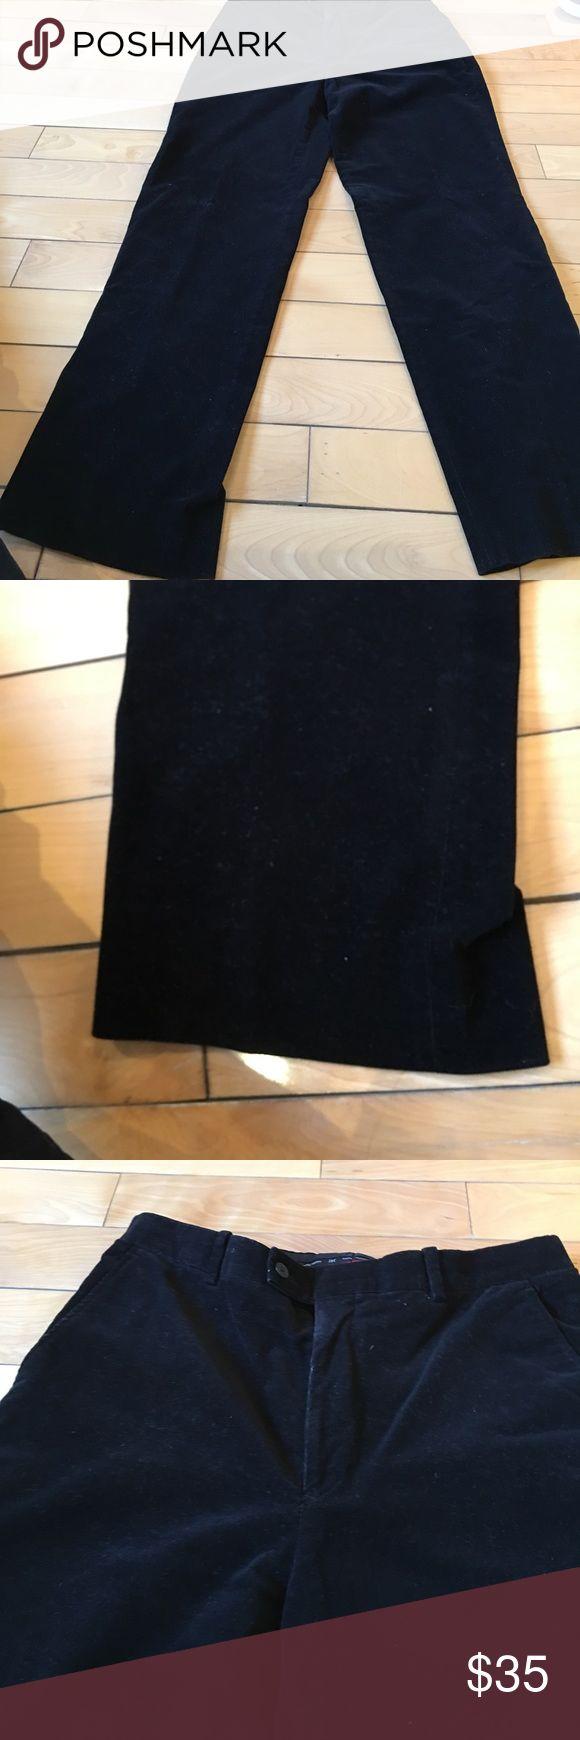 I.n.c men's corduroy pants 32/32 Like new men's light black corduroy pants by I.n.c.  2 side and 2 back pockets. 32 waist and 32 length i.n.c Pants Corduroy